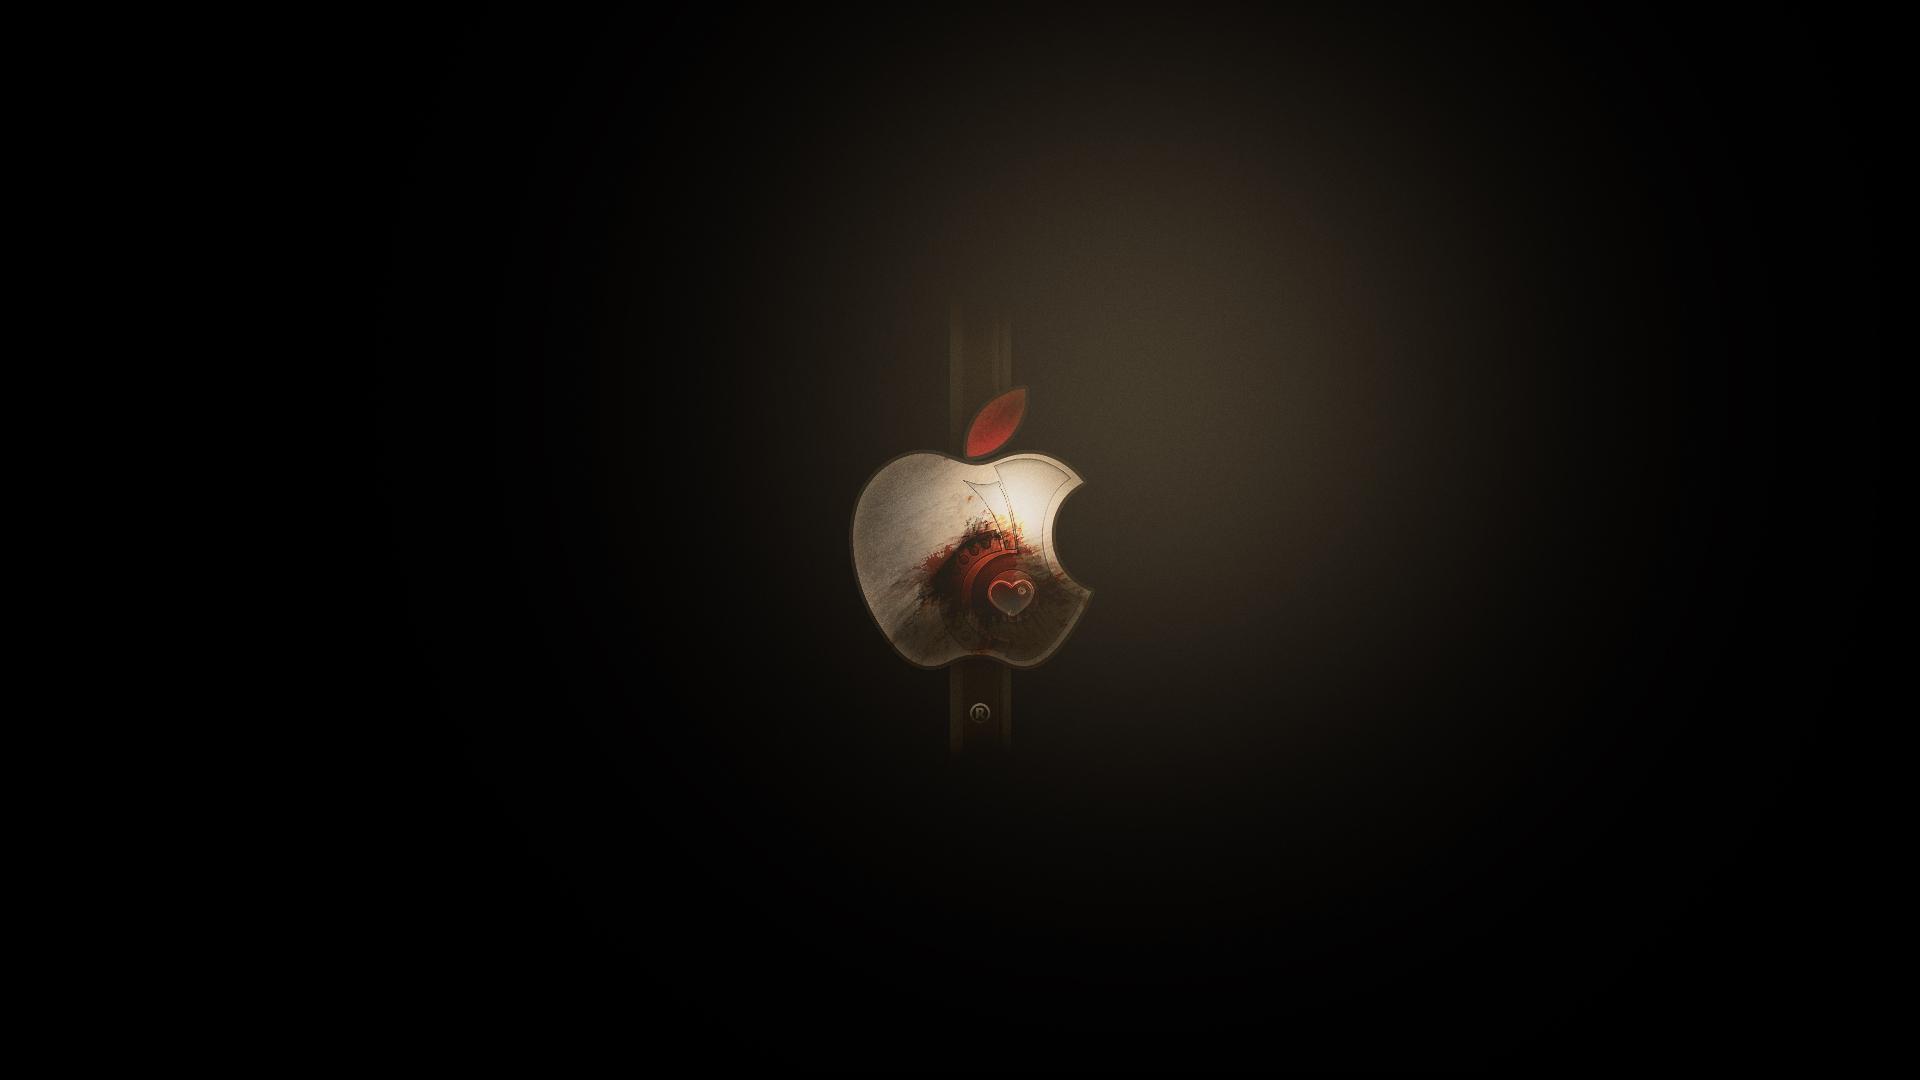 Sfondi Natalizi Apple.66 Metal Apple Wallpaper On Wallpapersafari